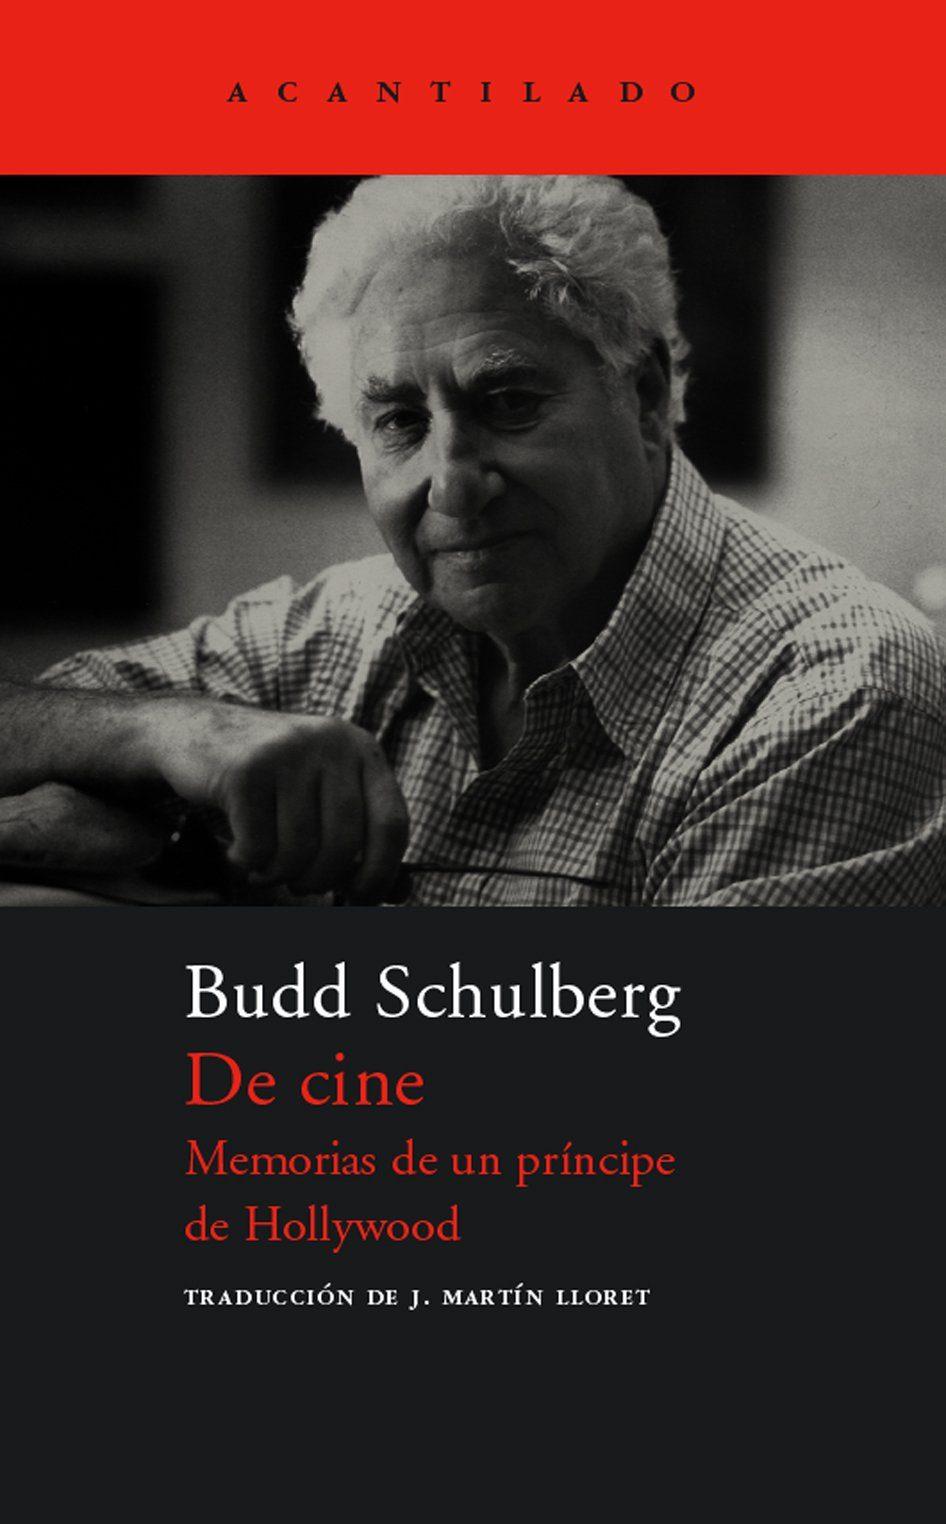 De Cine: Memorias De Un Príncipe De Hollywood - Schulberg Budd